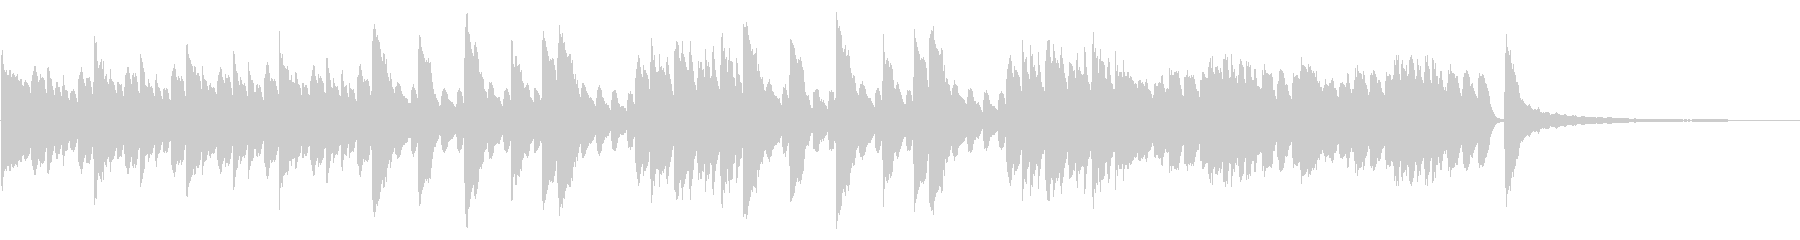 SNS広告 ピアノメイン きれいの未再生の波形